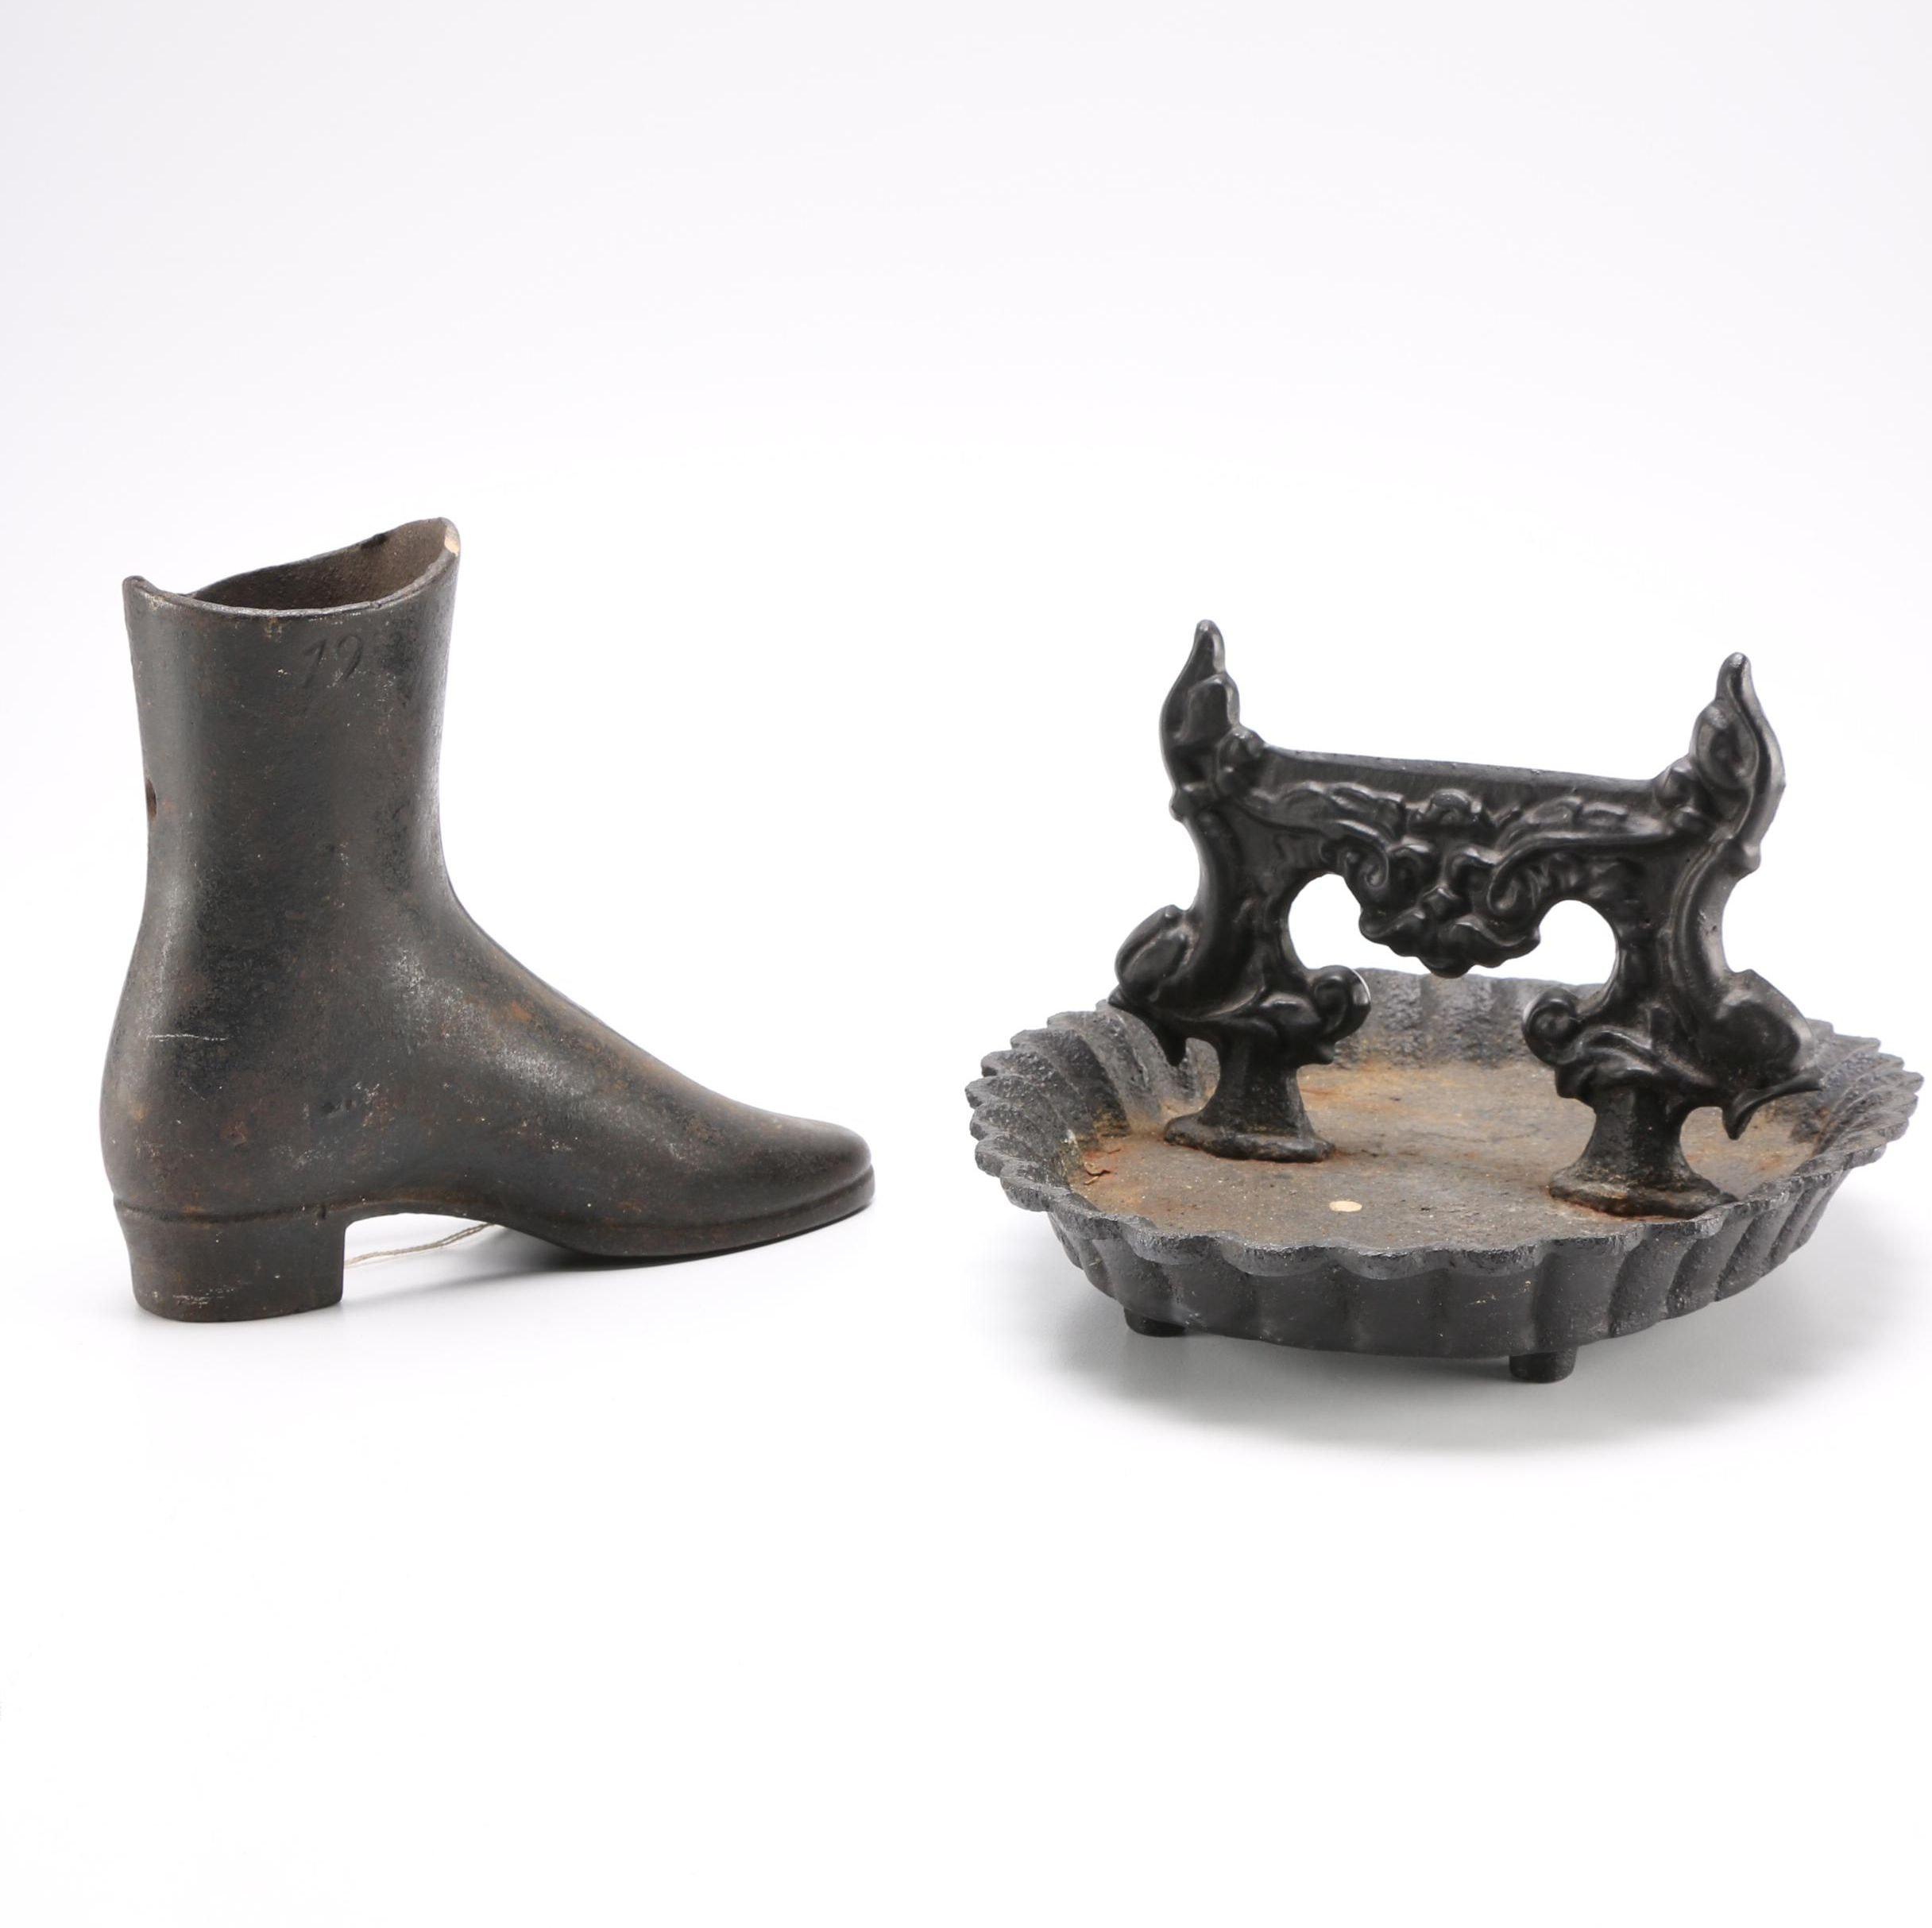 Cast Iron Boot and Boot Scraper